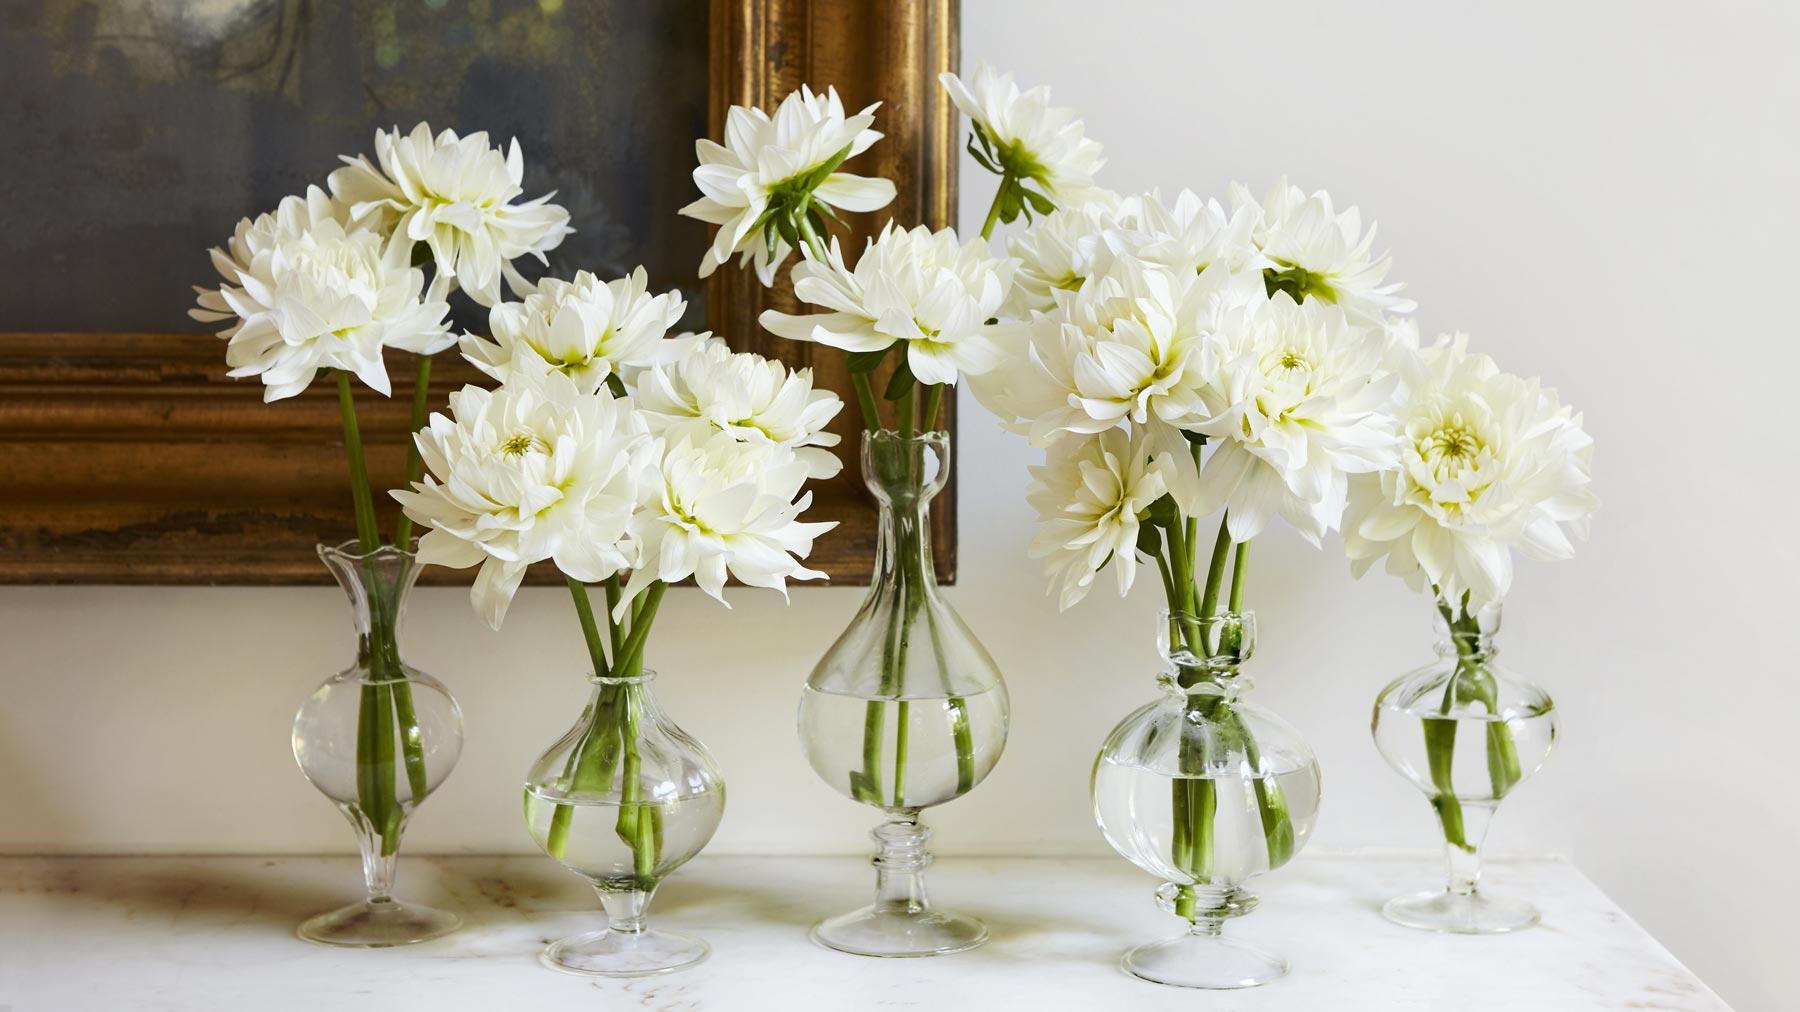 Flowerbx Extraordinary Flowers Delivered